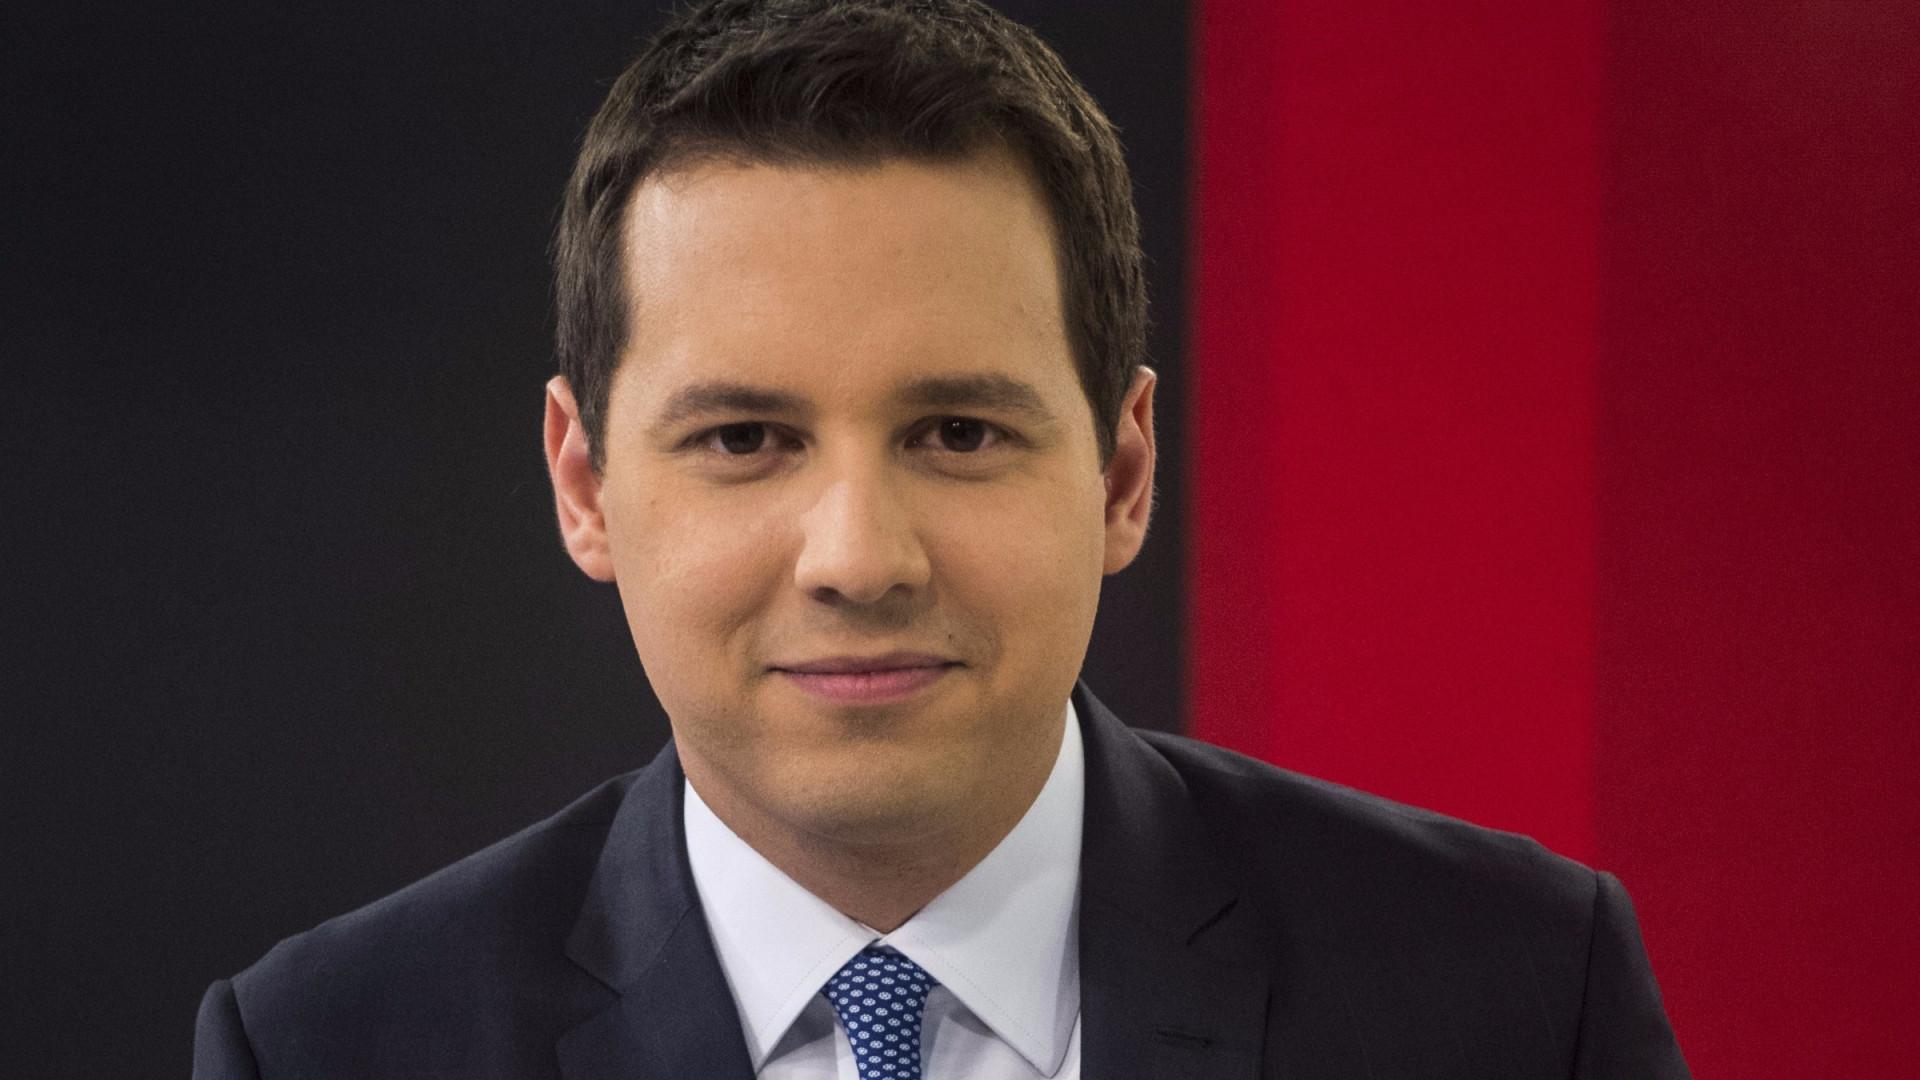 Dony de Nuccio deixa Globo após envolvimento com banco